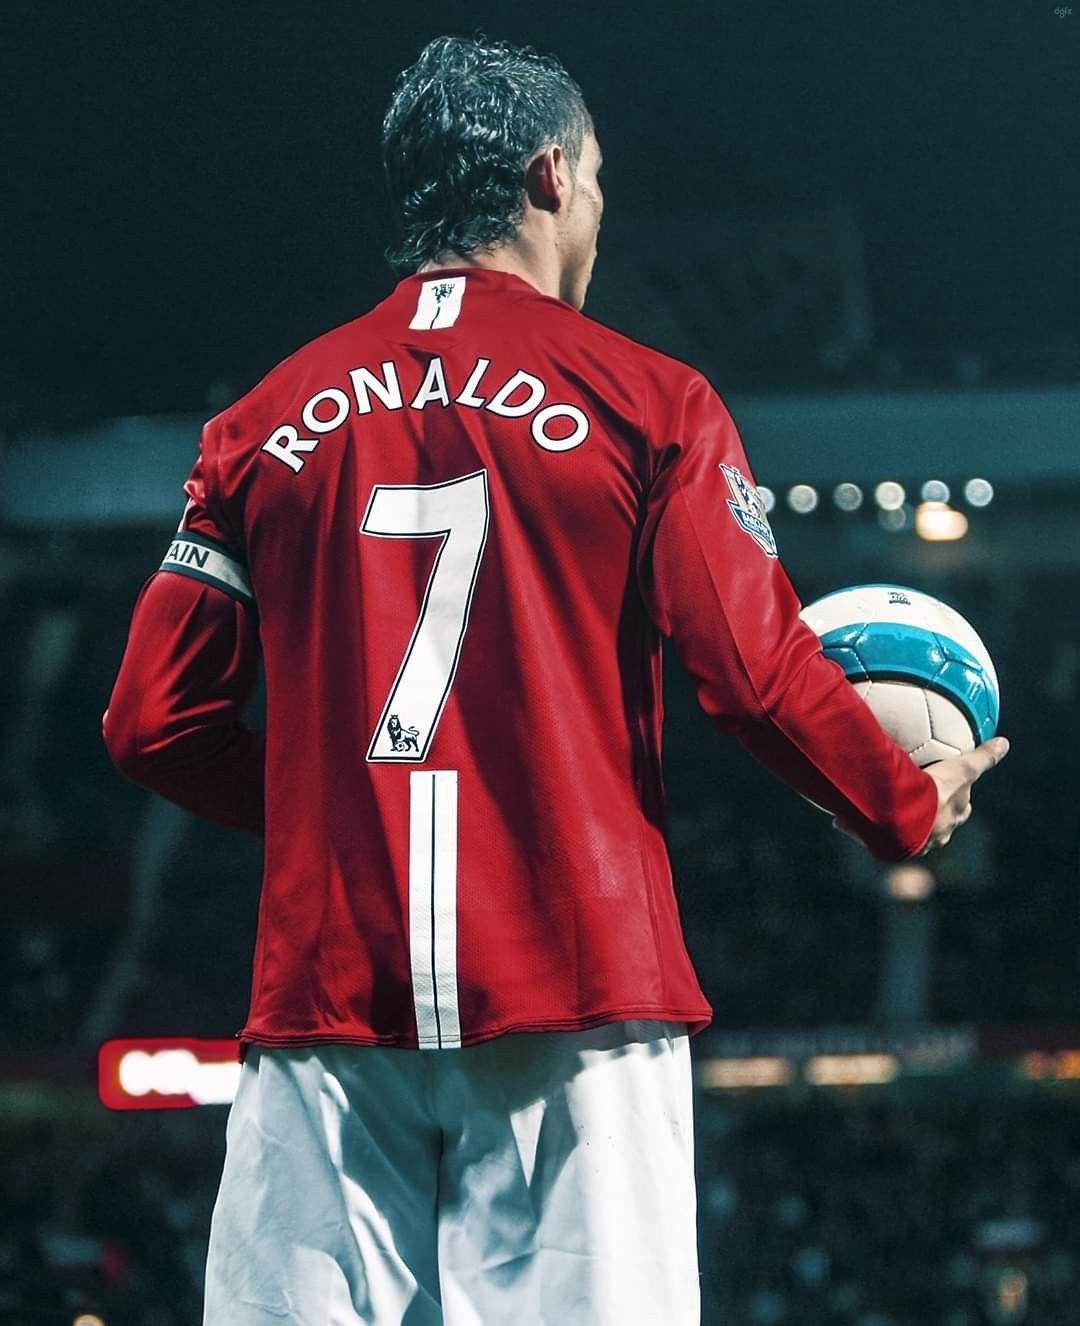 100 Idées De Cristiano Footballeur Cristiano Jr Joueur De Football